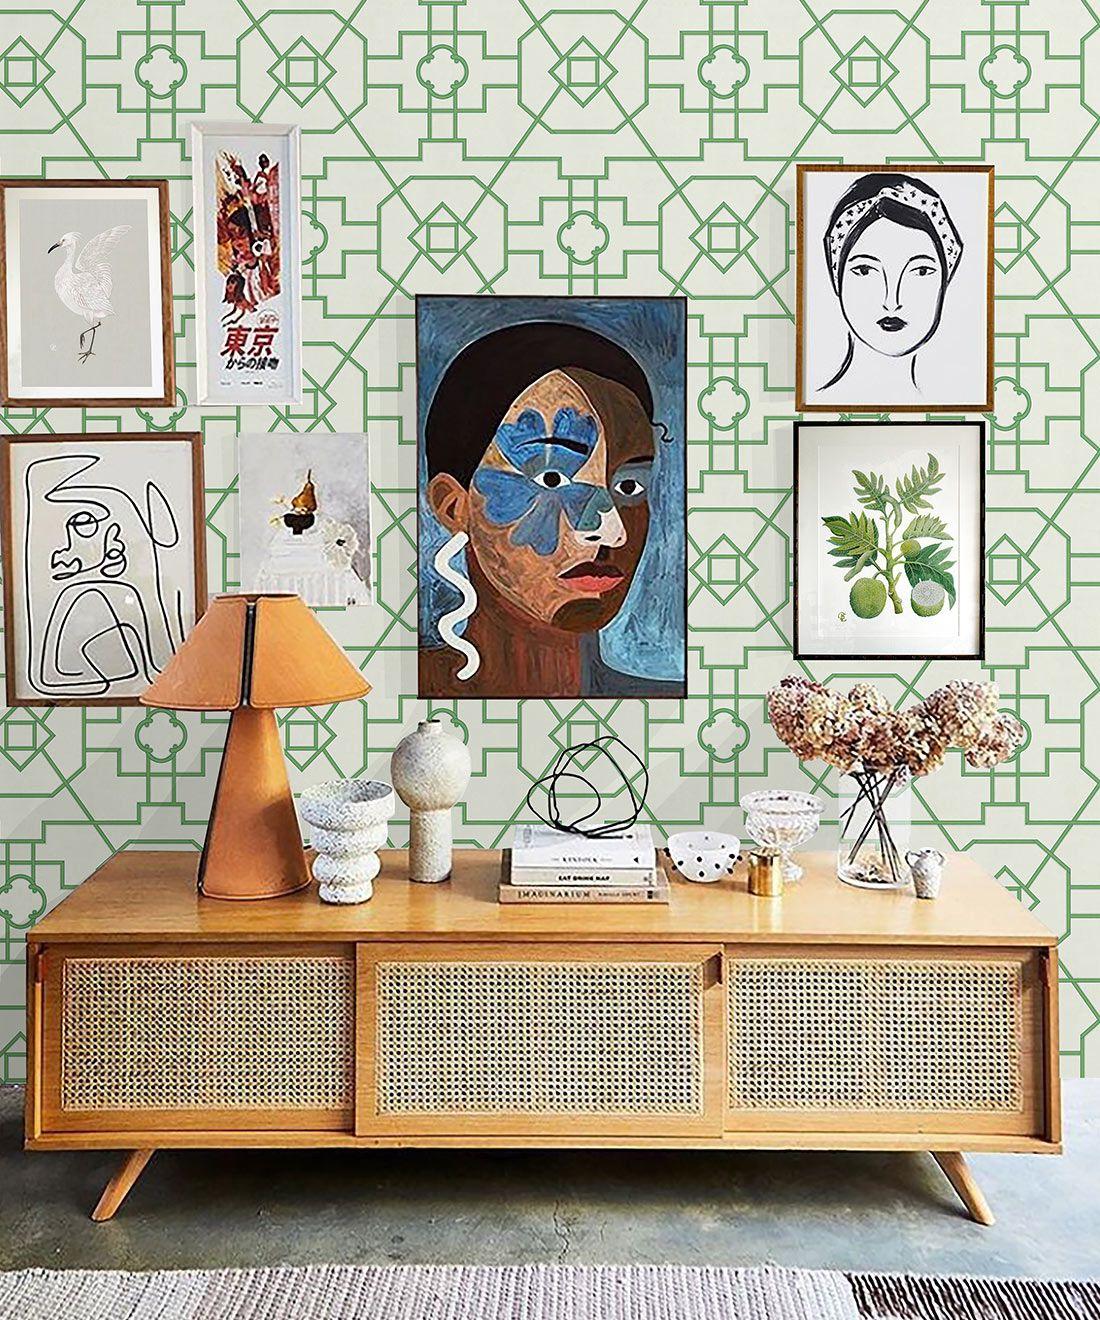 Trellis Wallpaper • Geometric Wallpaper • Ivory Wallpaper • Insitu behind a light wood cabinet